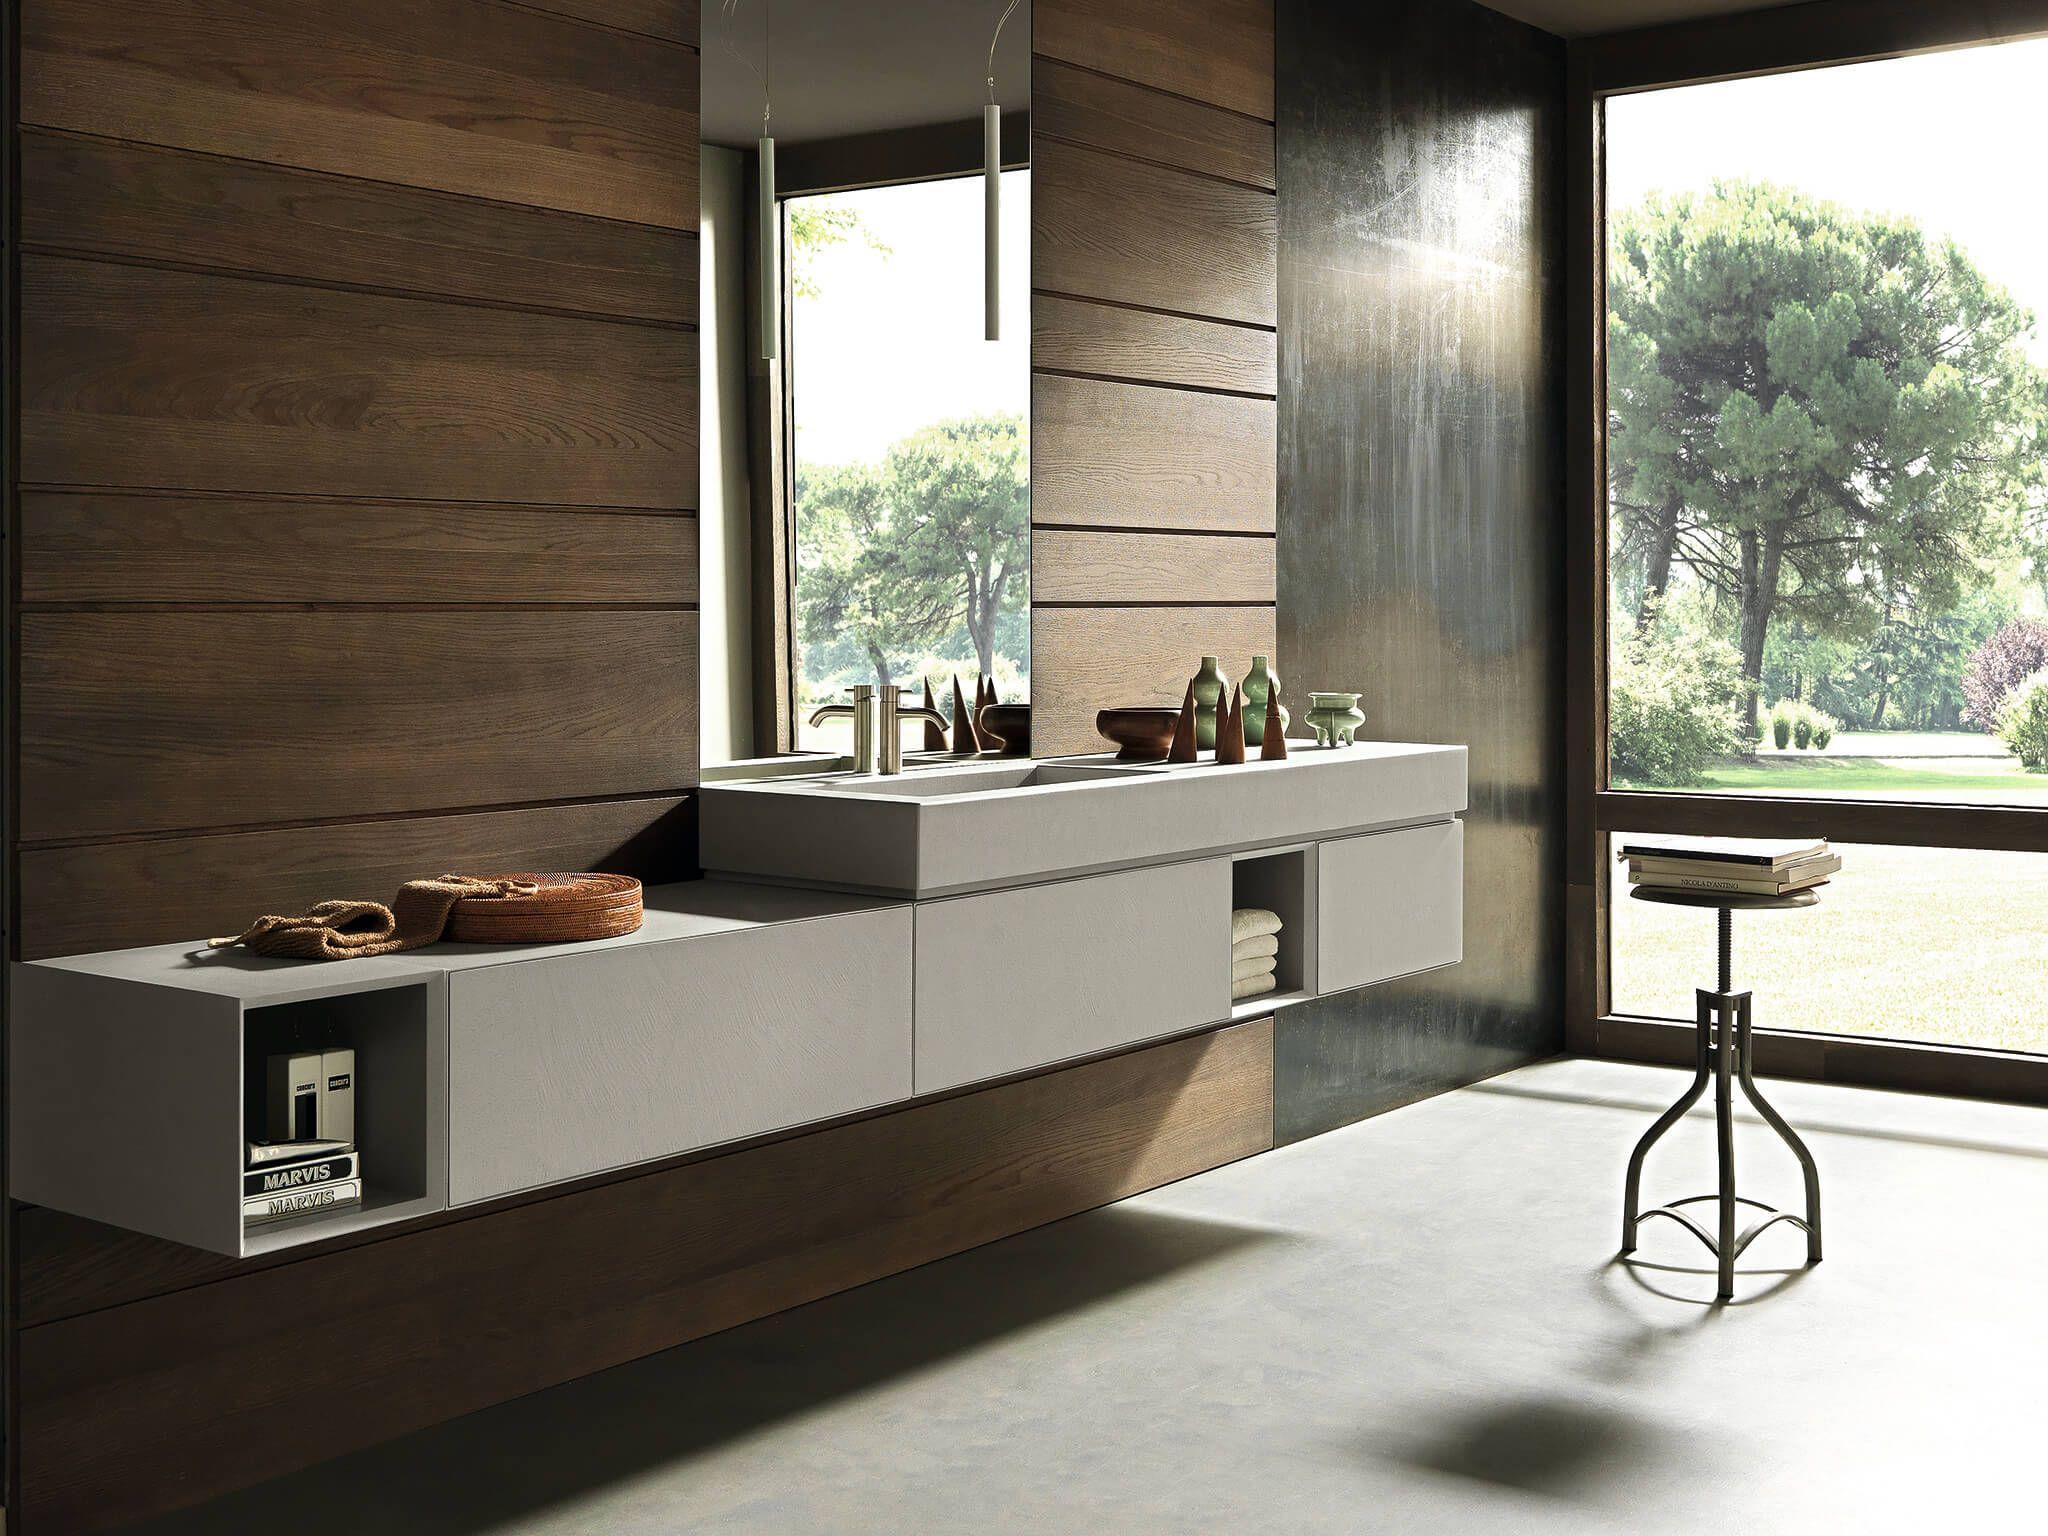 bathroom vanity, wooden wall, grey floating cabinet, grey floor, mirror